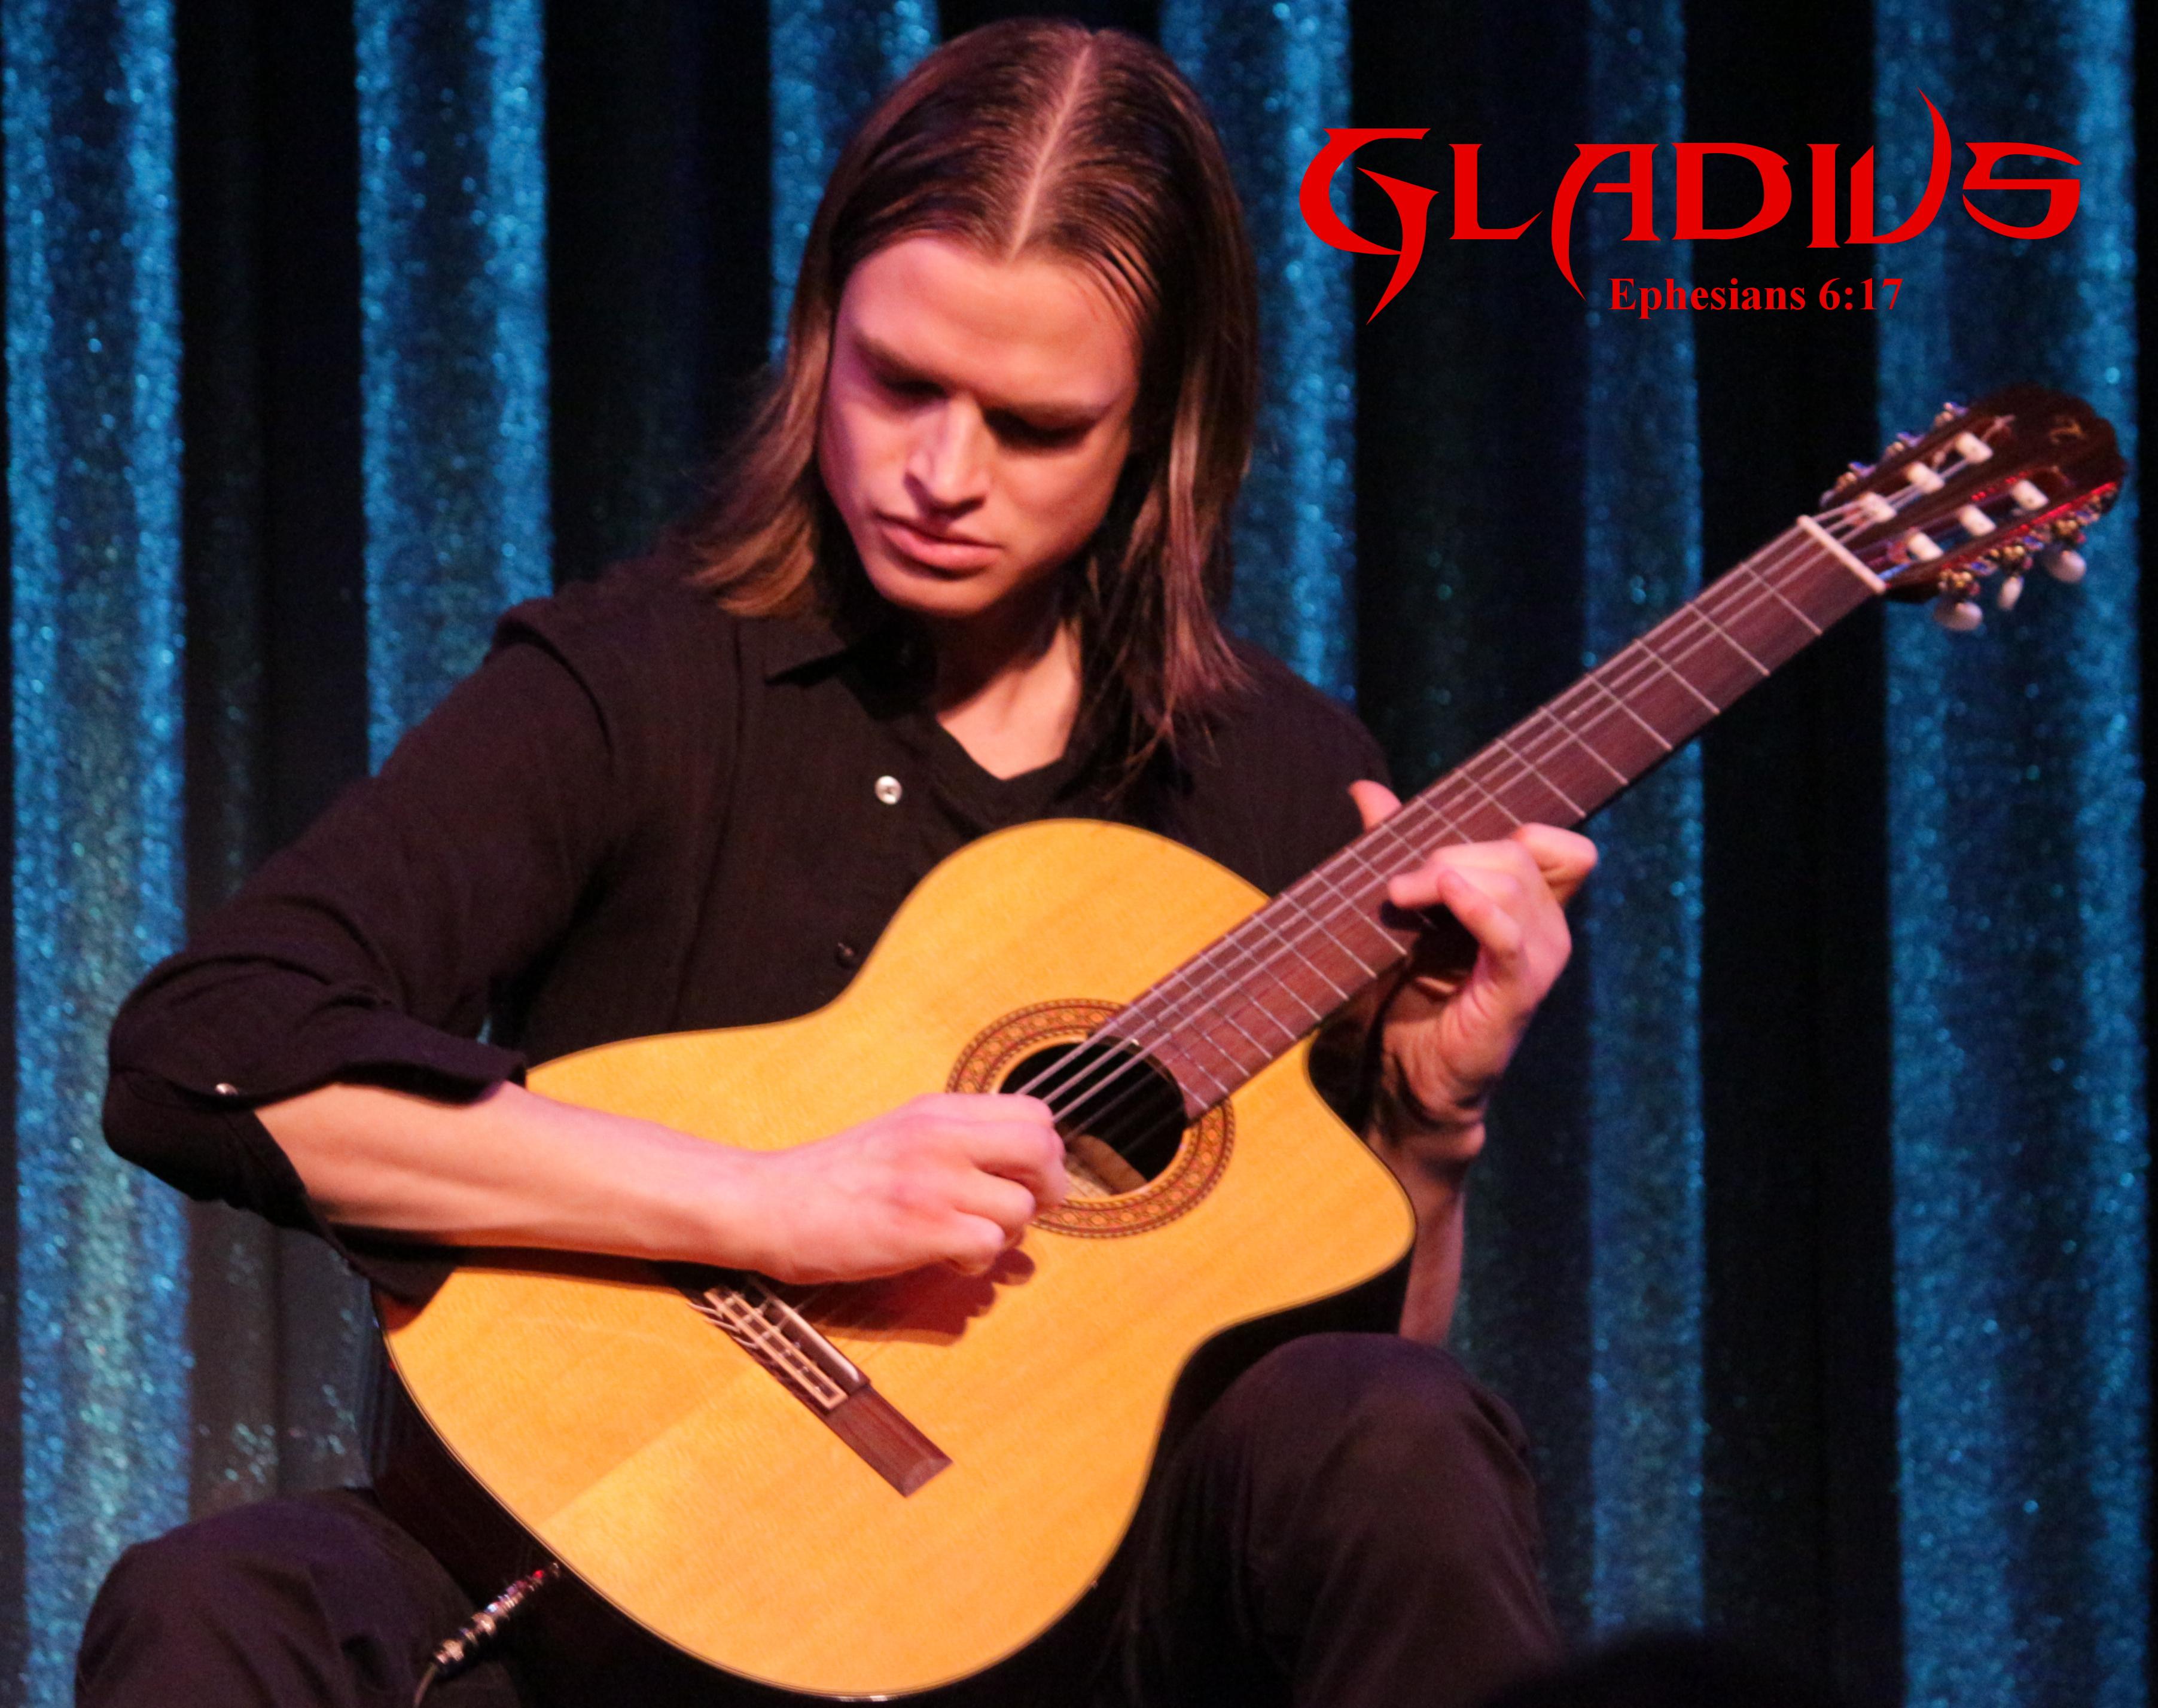 Gladius : A Virtual Music Performance